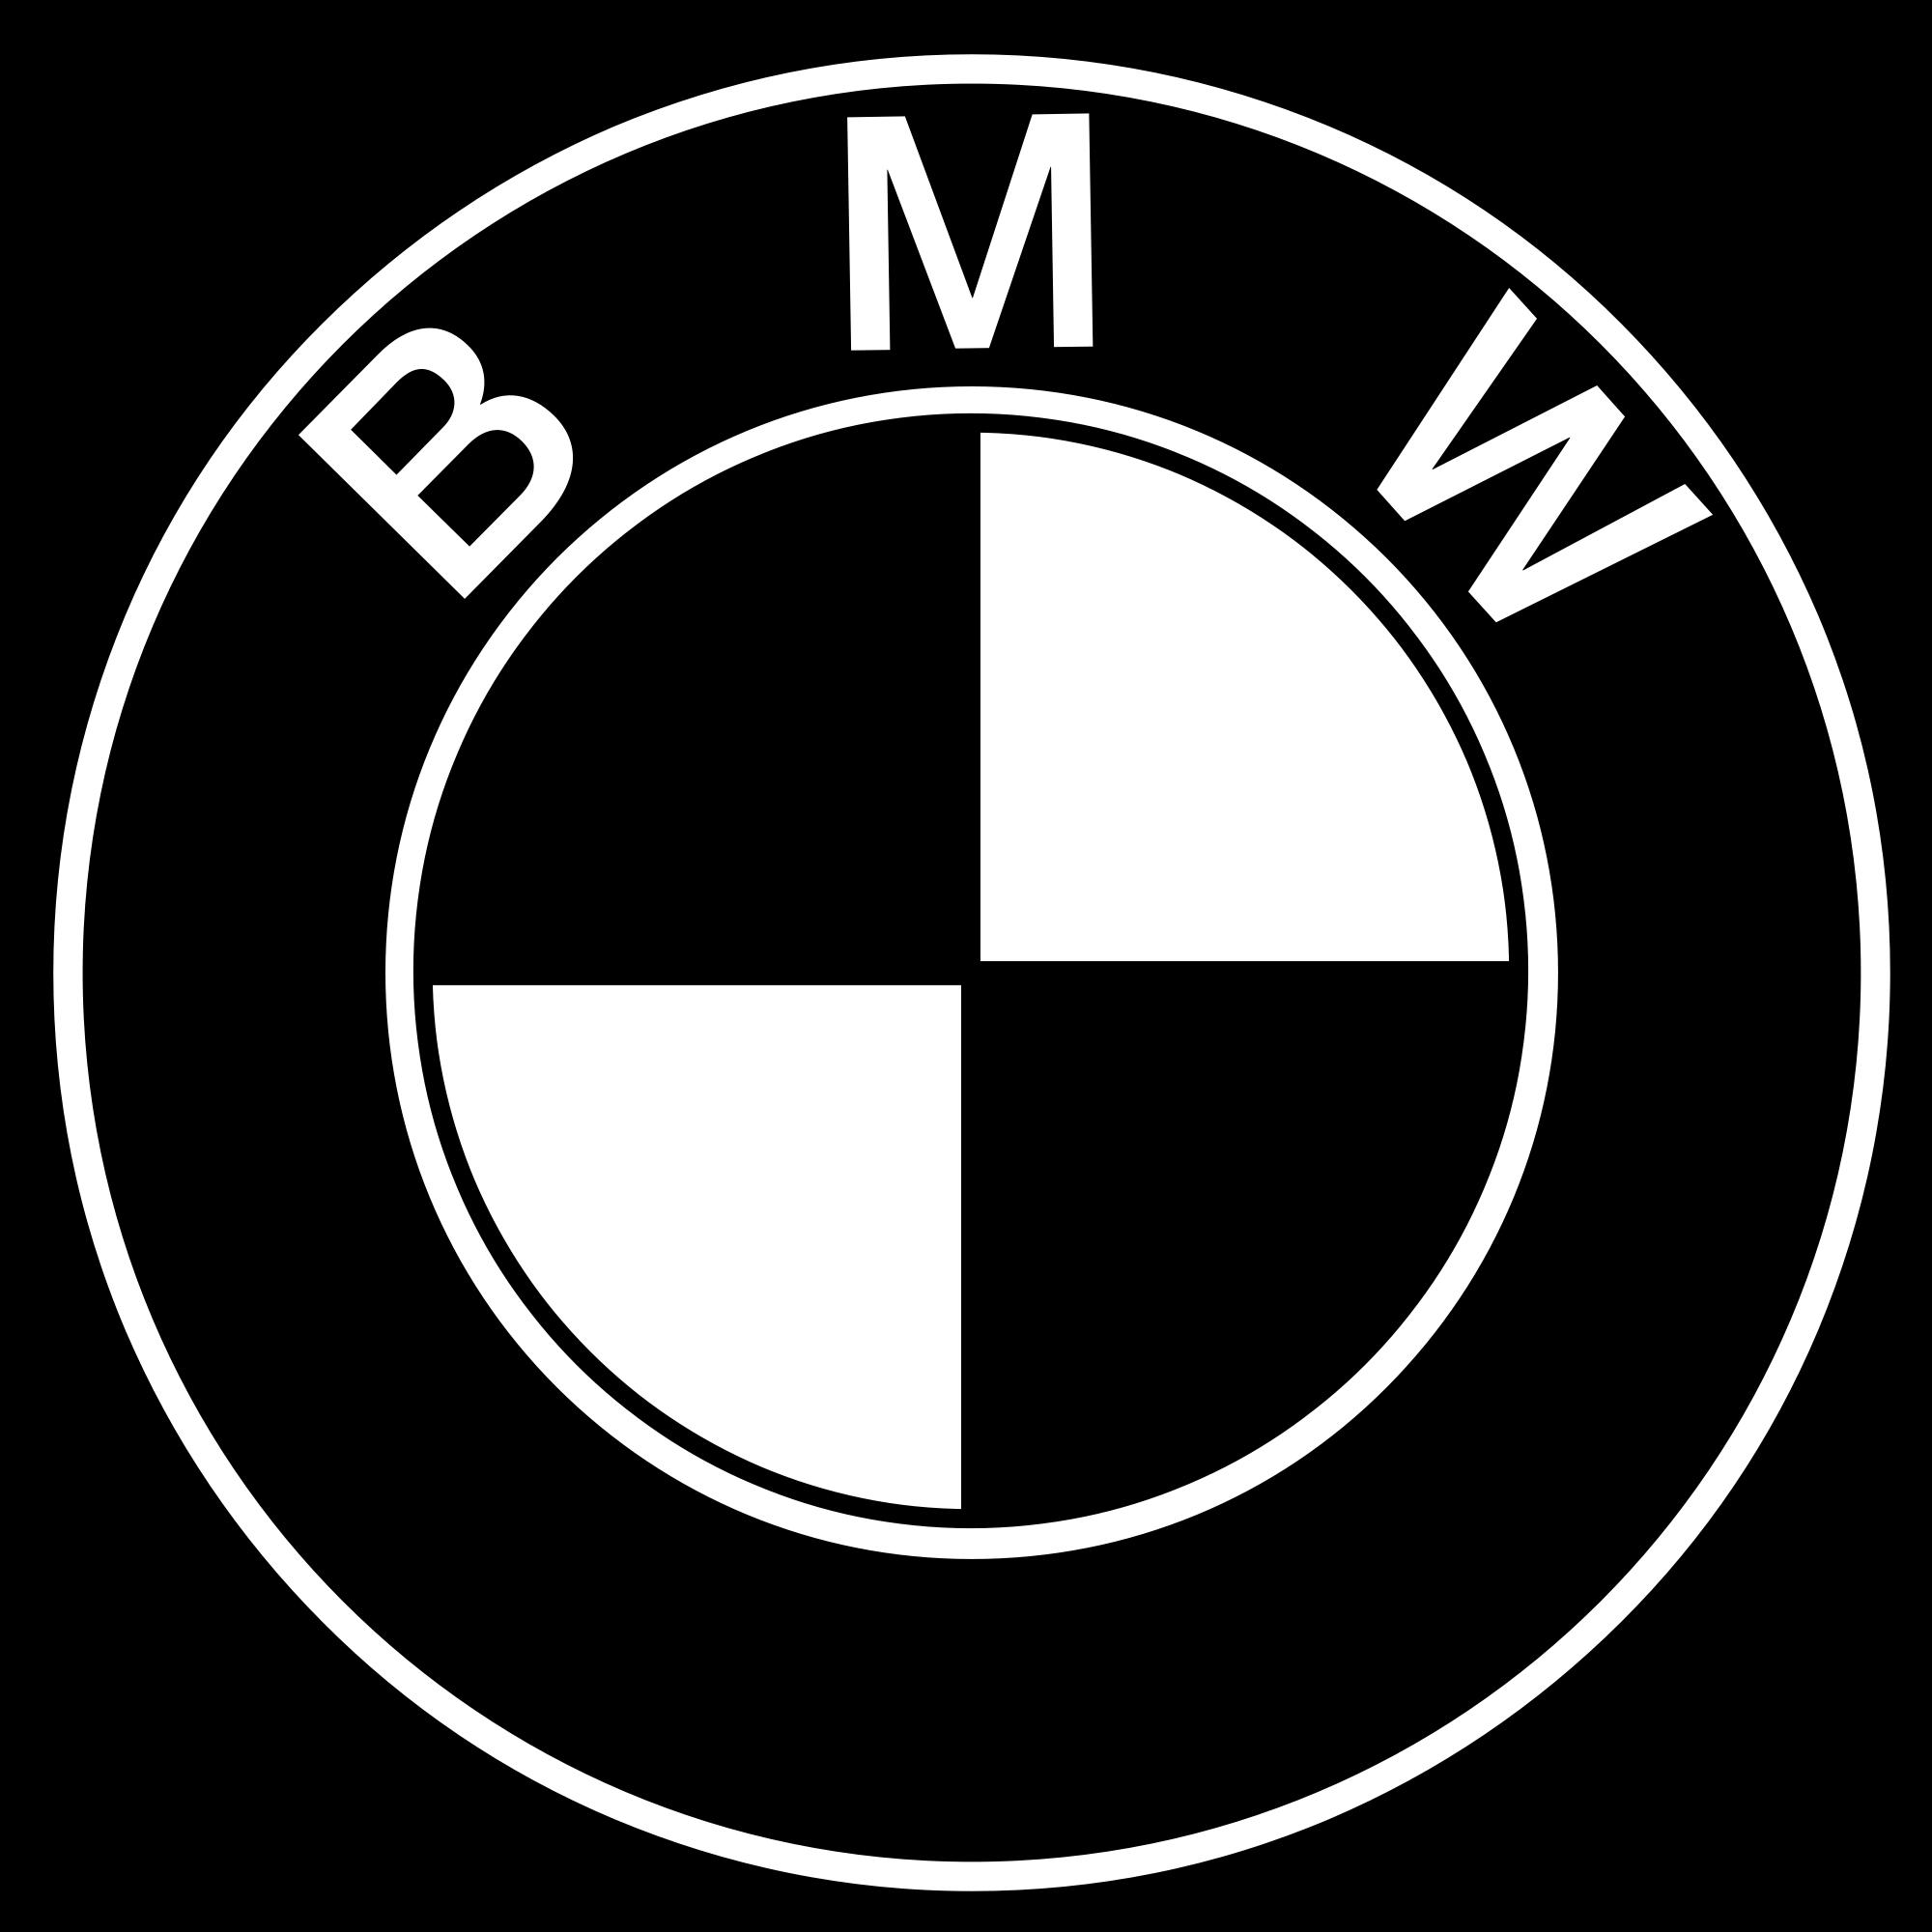 Logo bmw clipart graphic freeuse Free BMW Logo Cliparts, Download Free Clip Art, Free Clip Art on ... graphic freeuse